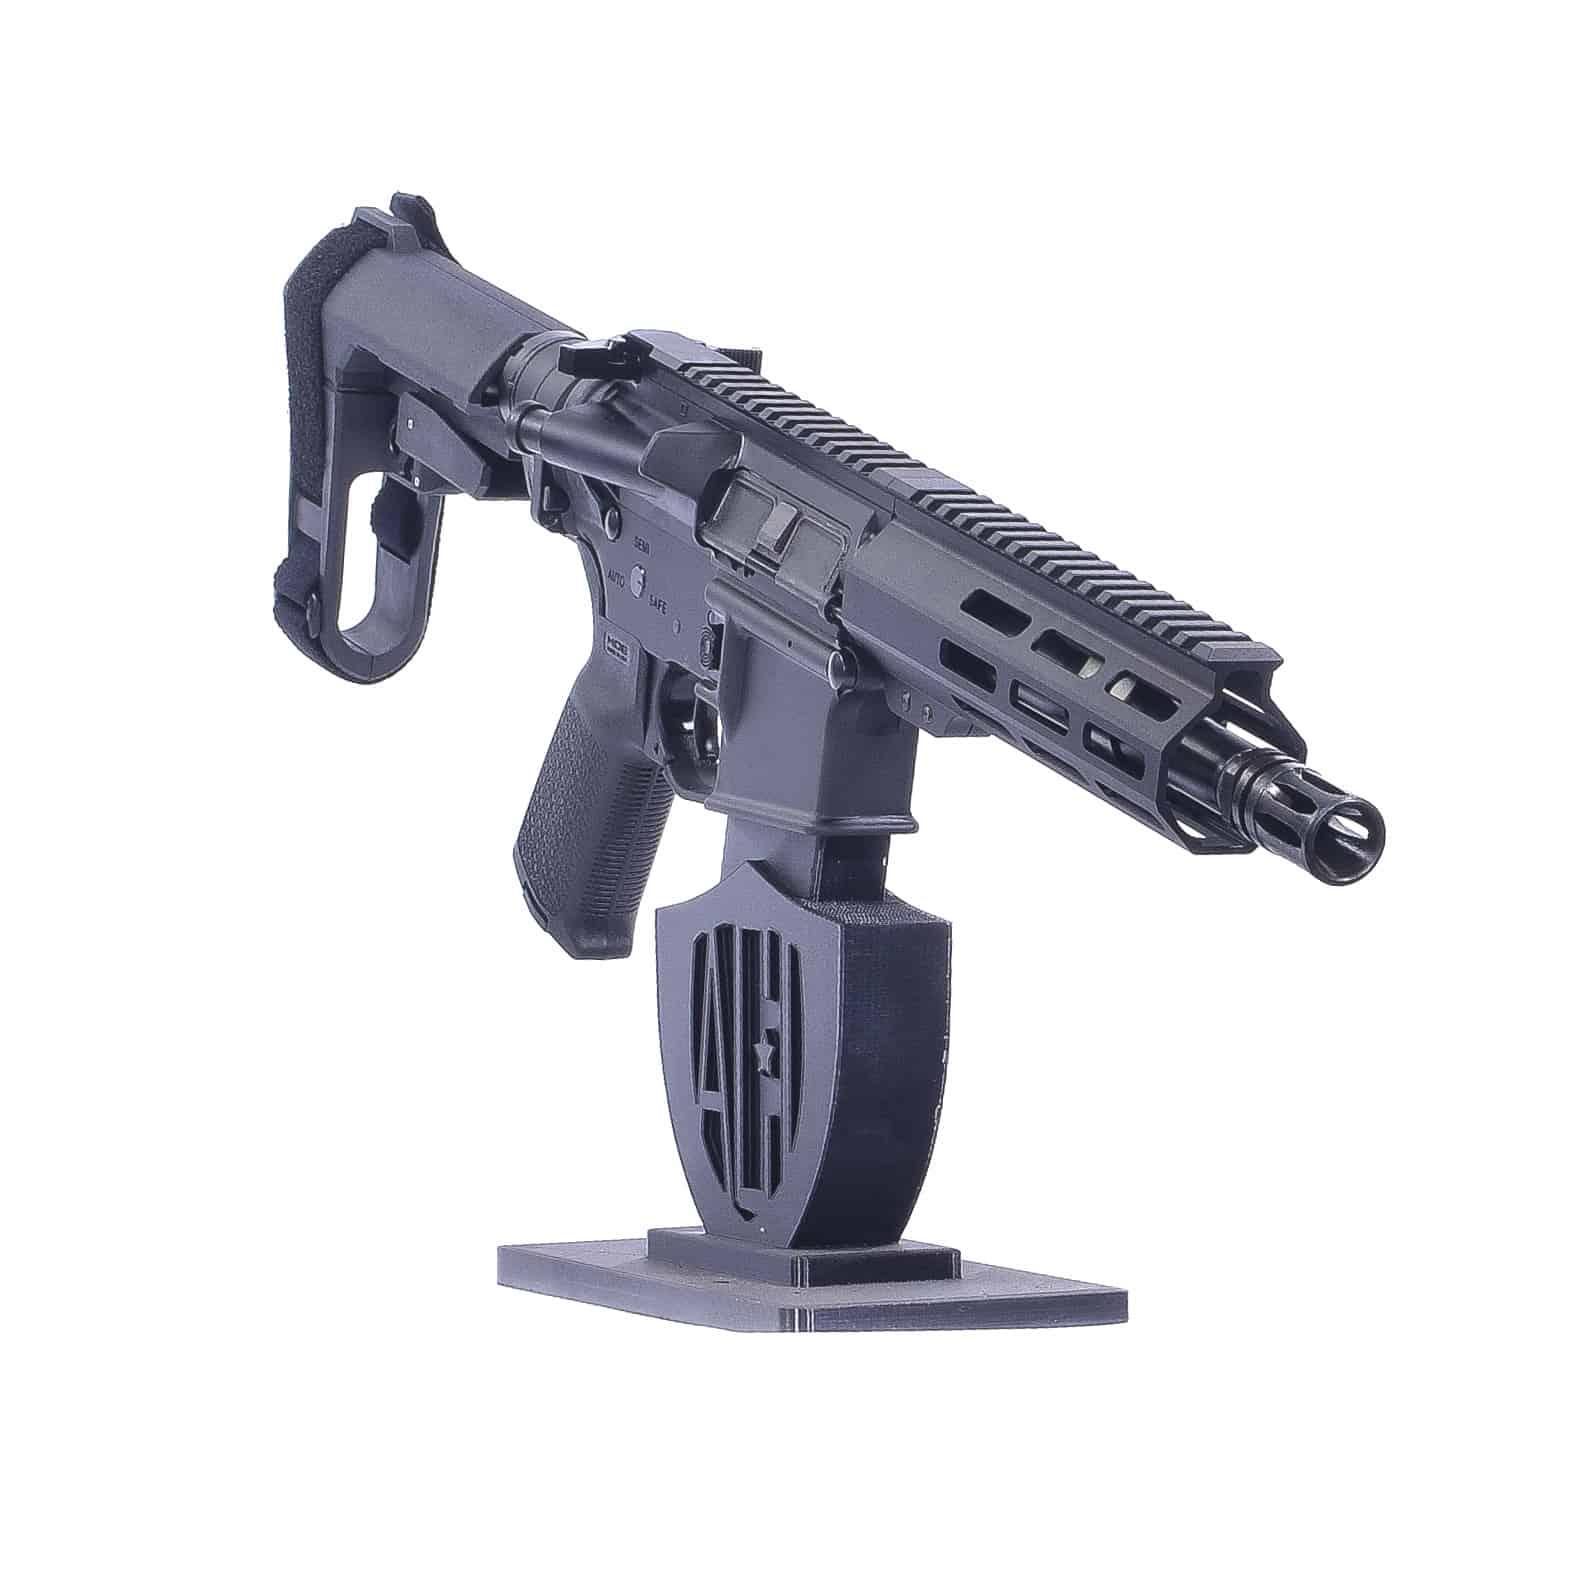 AR15 556 PISTOL 8 INCH SBA3 MLOK Andro Corp AR15 Pistol